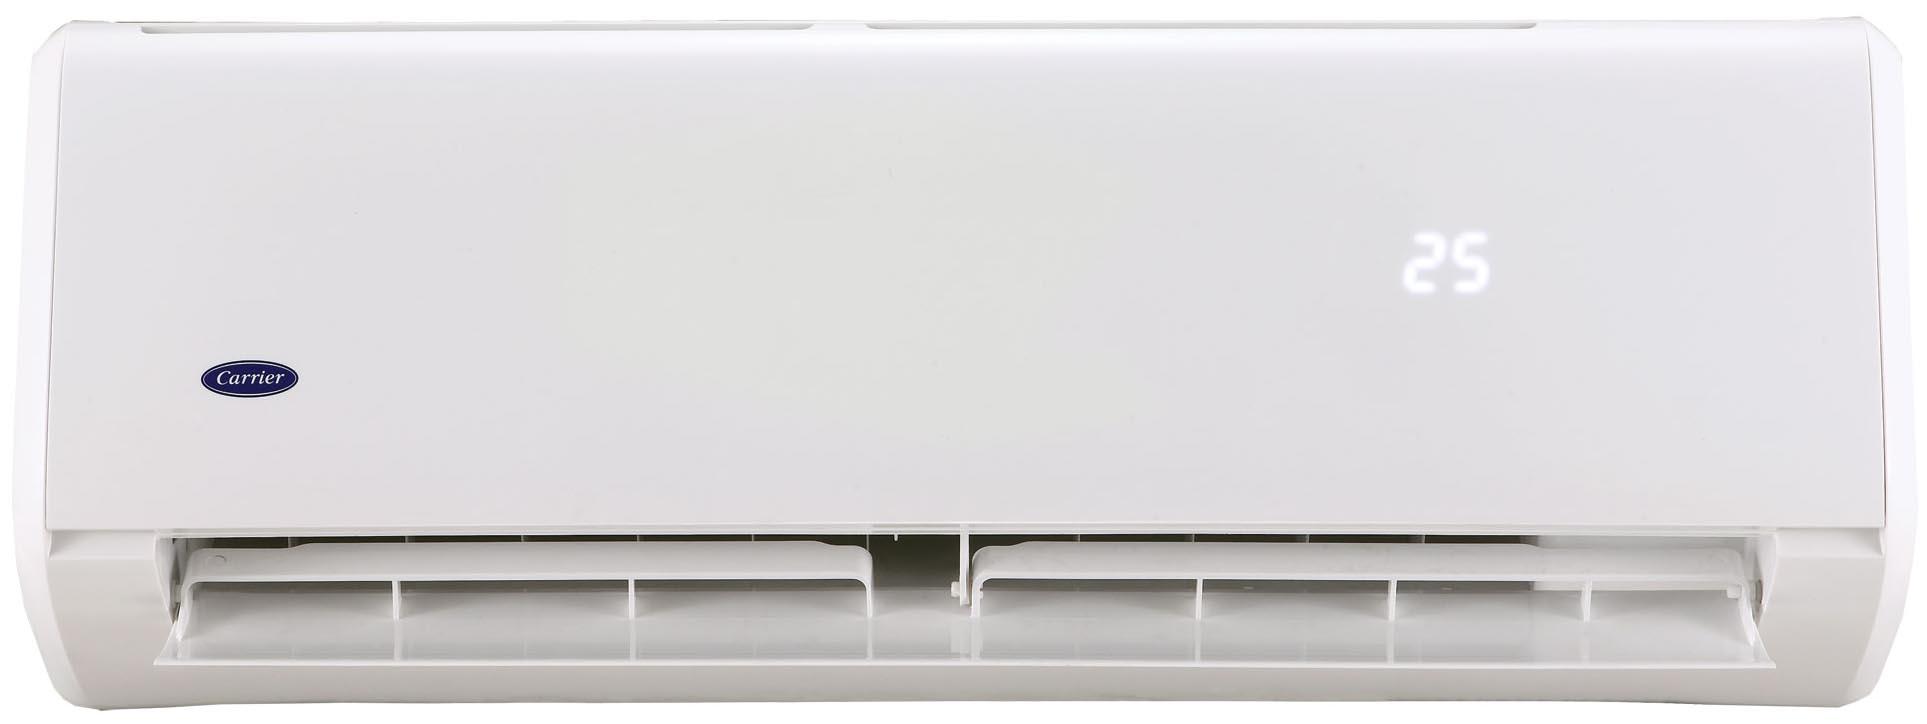 Carrier 42QHC024DS / 38QHC024DS серии Crystal Inverter